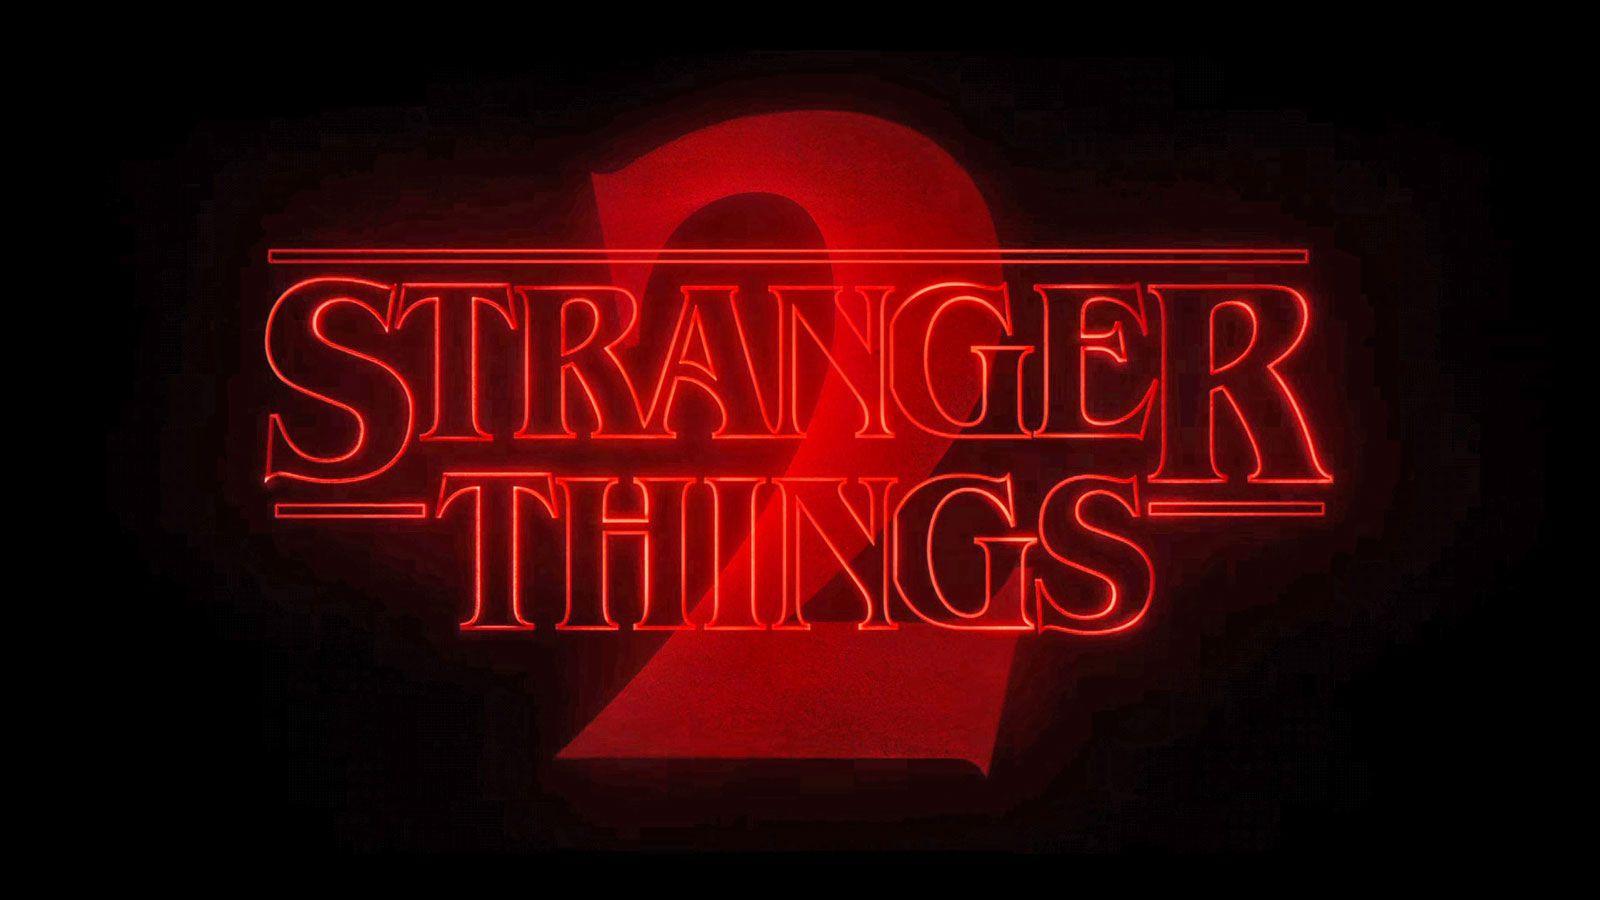 Stranger Things 2 Wallpapers